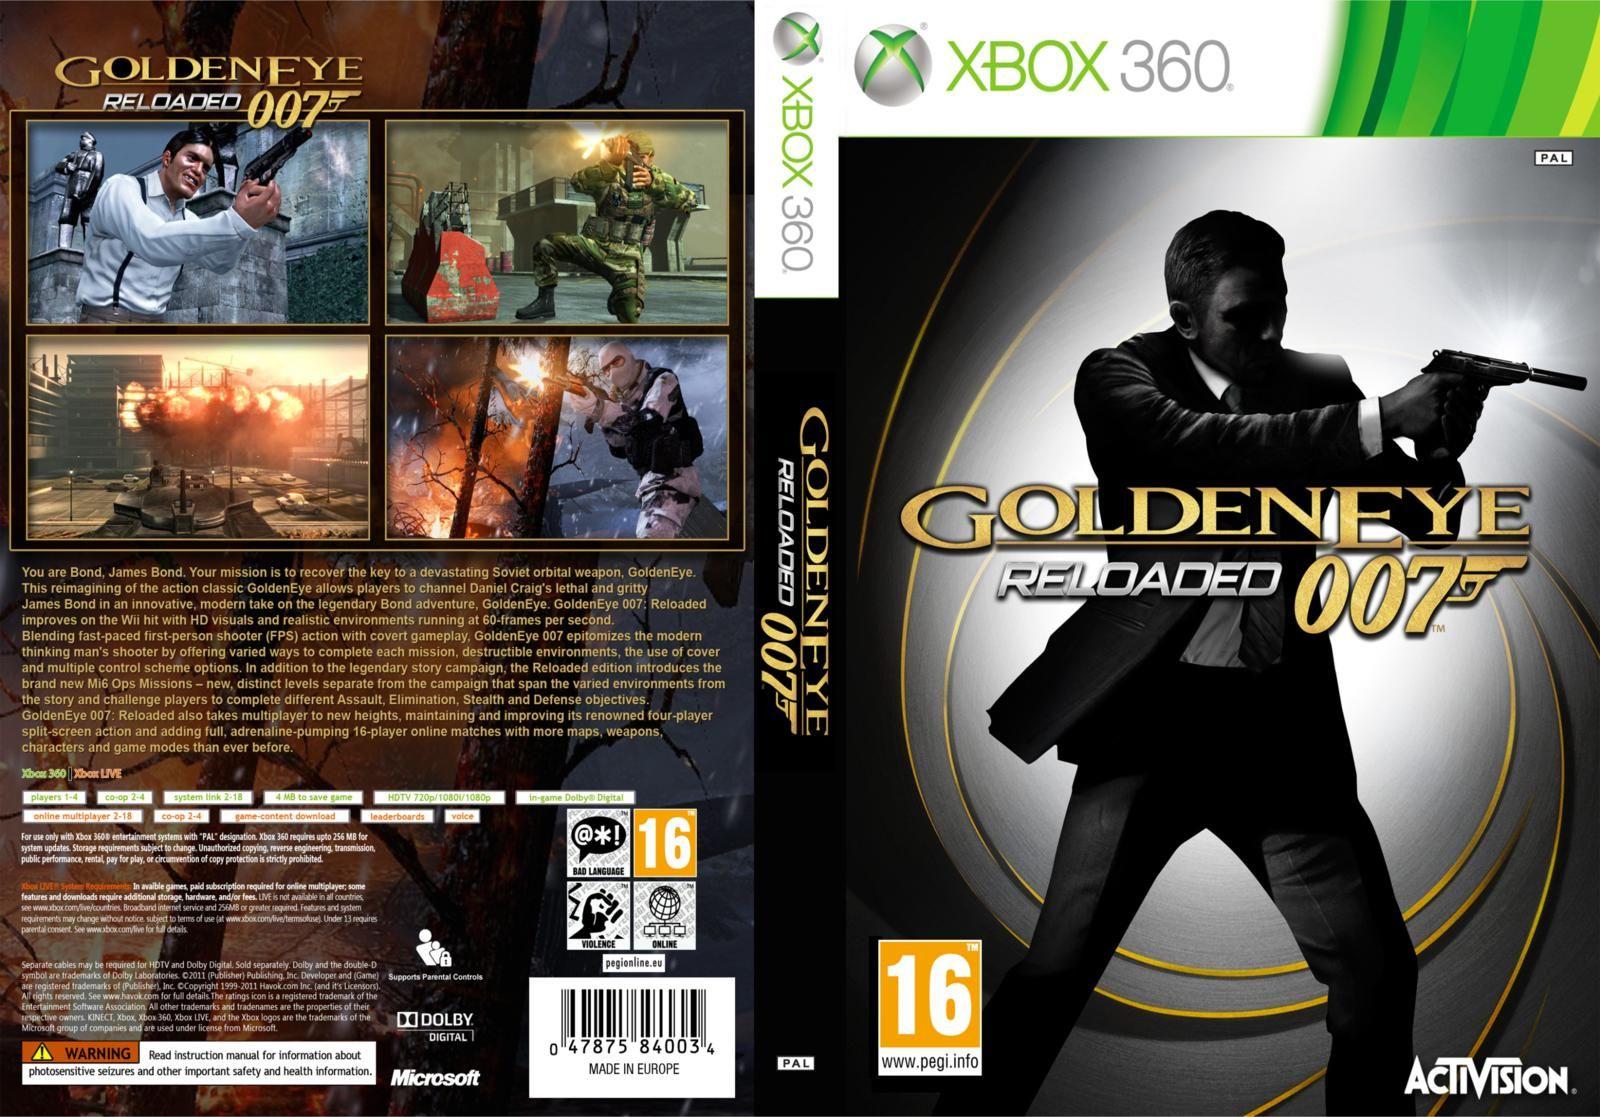 womens nike air max 2014 621078 007 goldeneye game cartridge